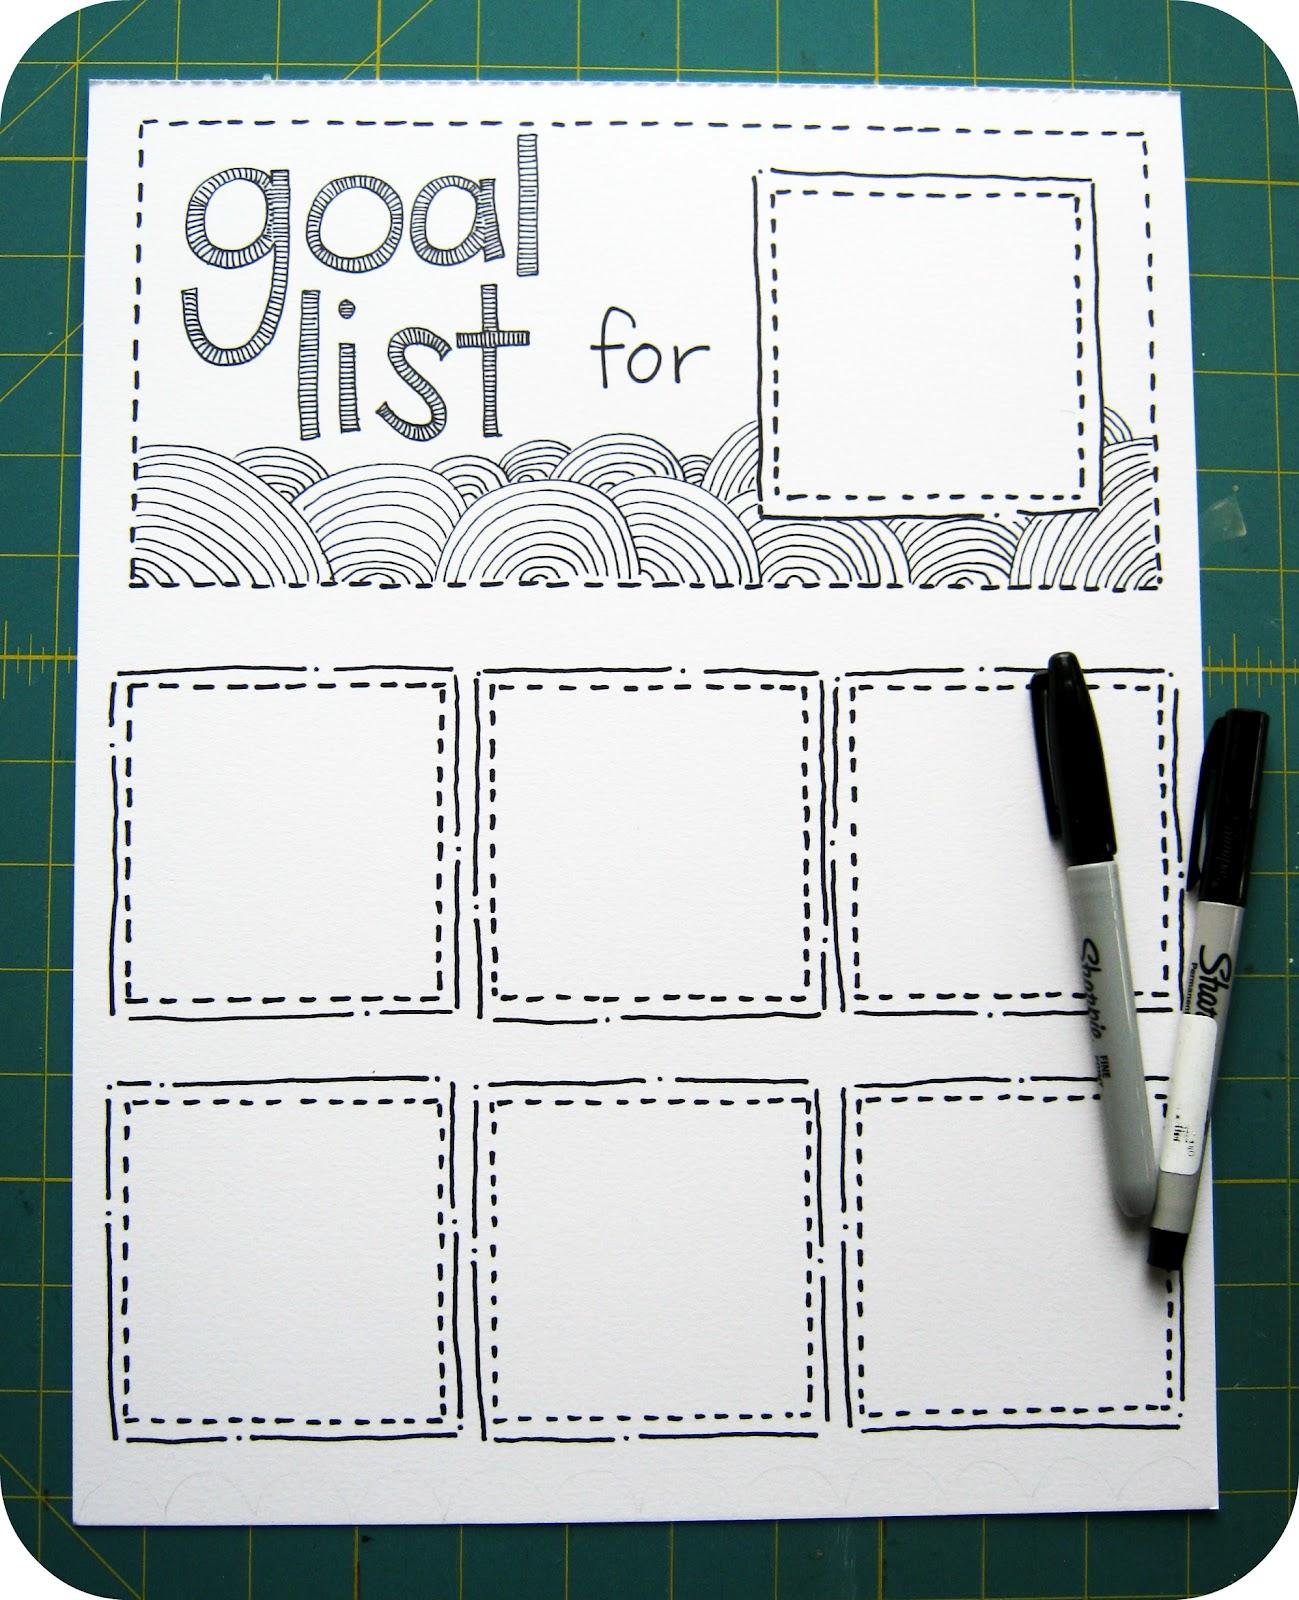 scrap n a snap designs organize your goals. Black Bedroom Furniture Sets. Home Design Ideas